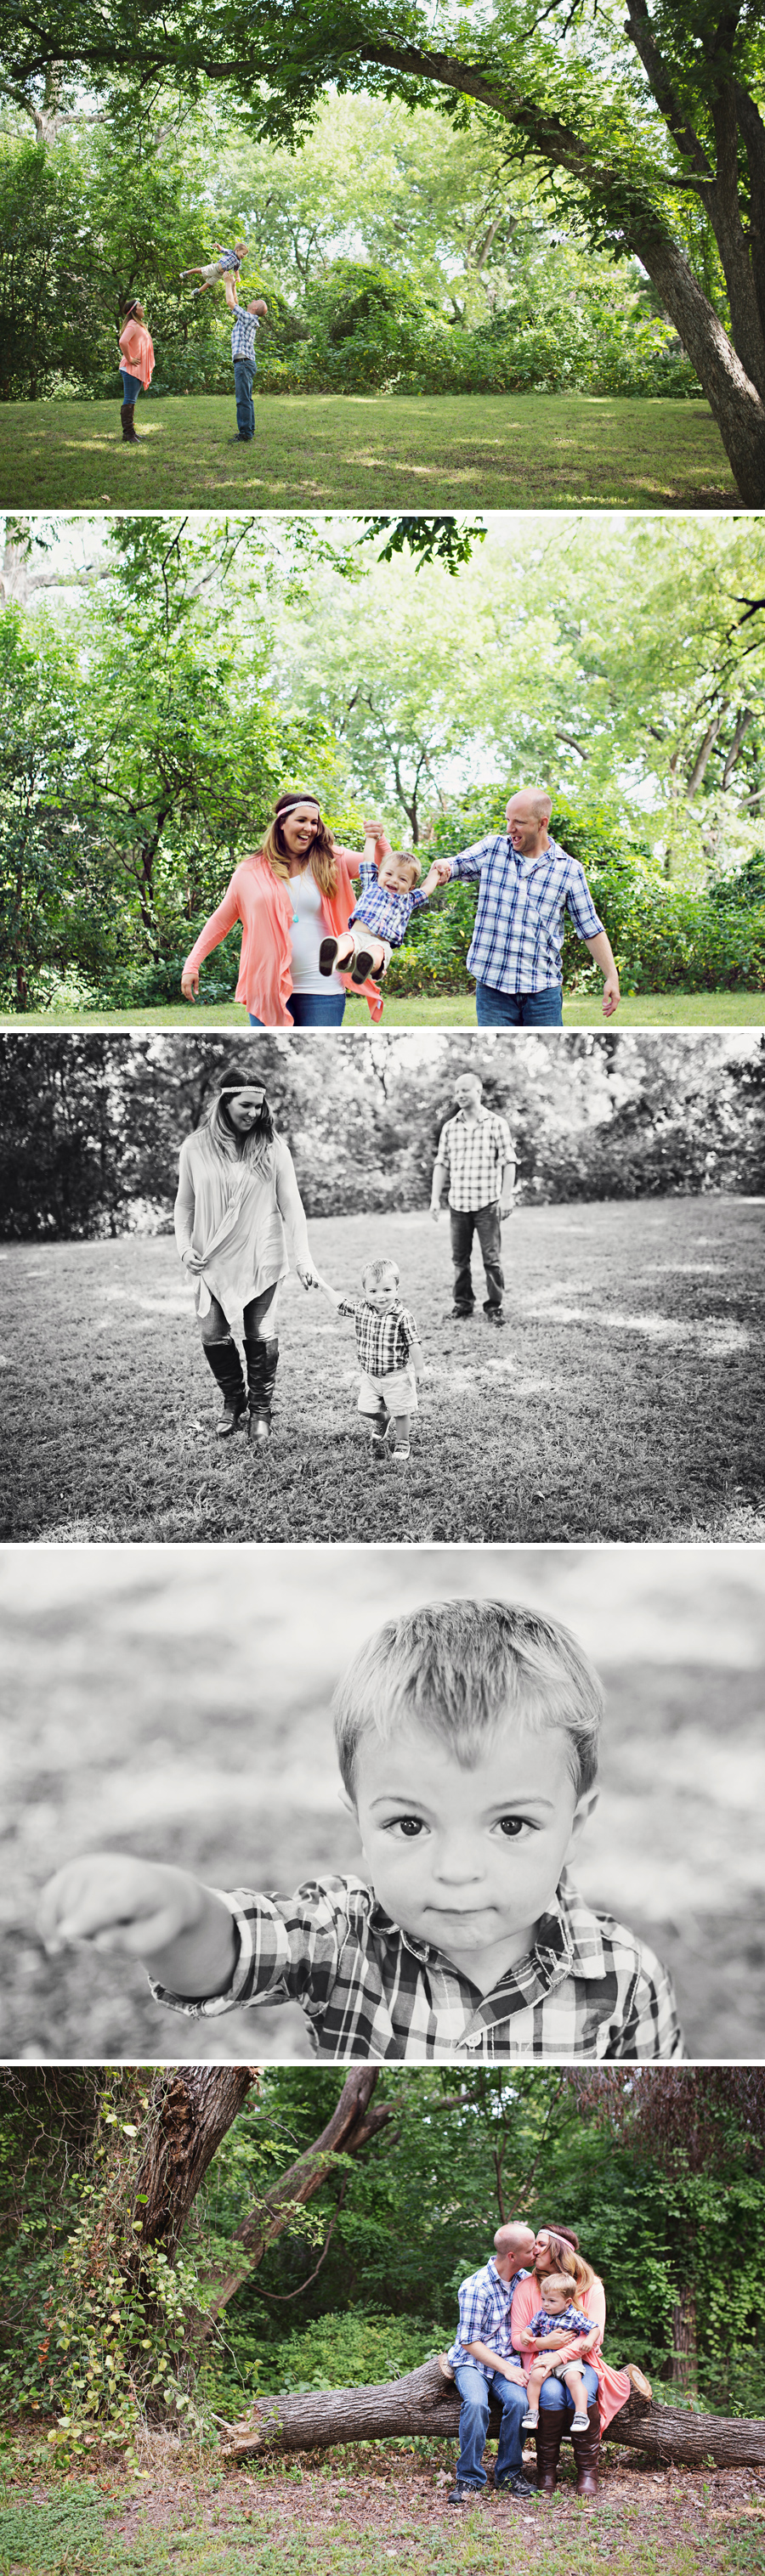 Dallas-Family-PhotographerG003